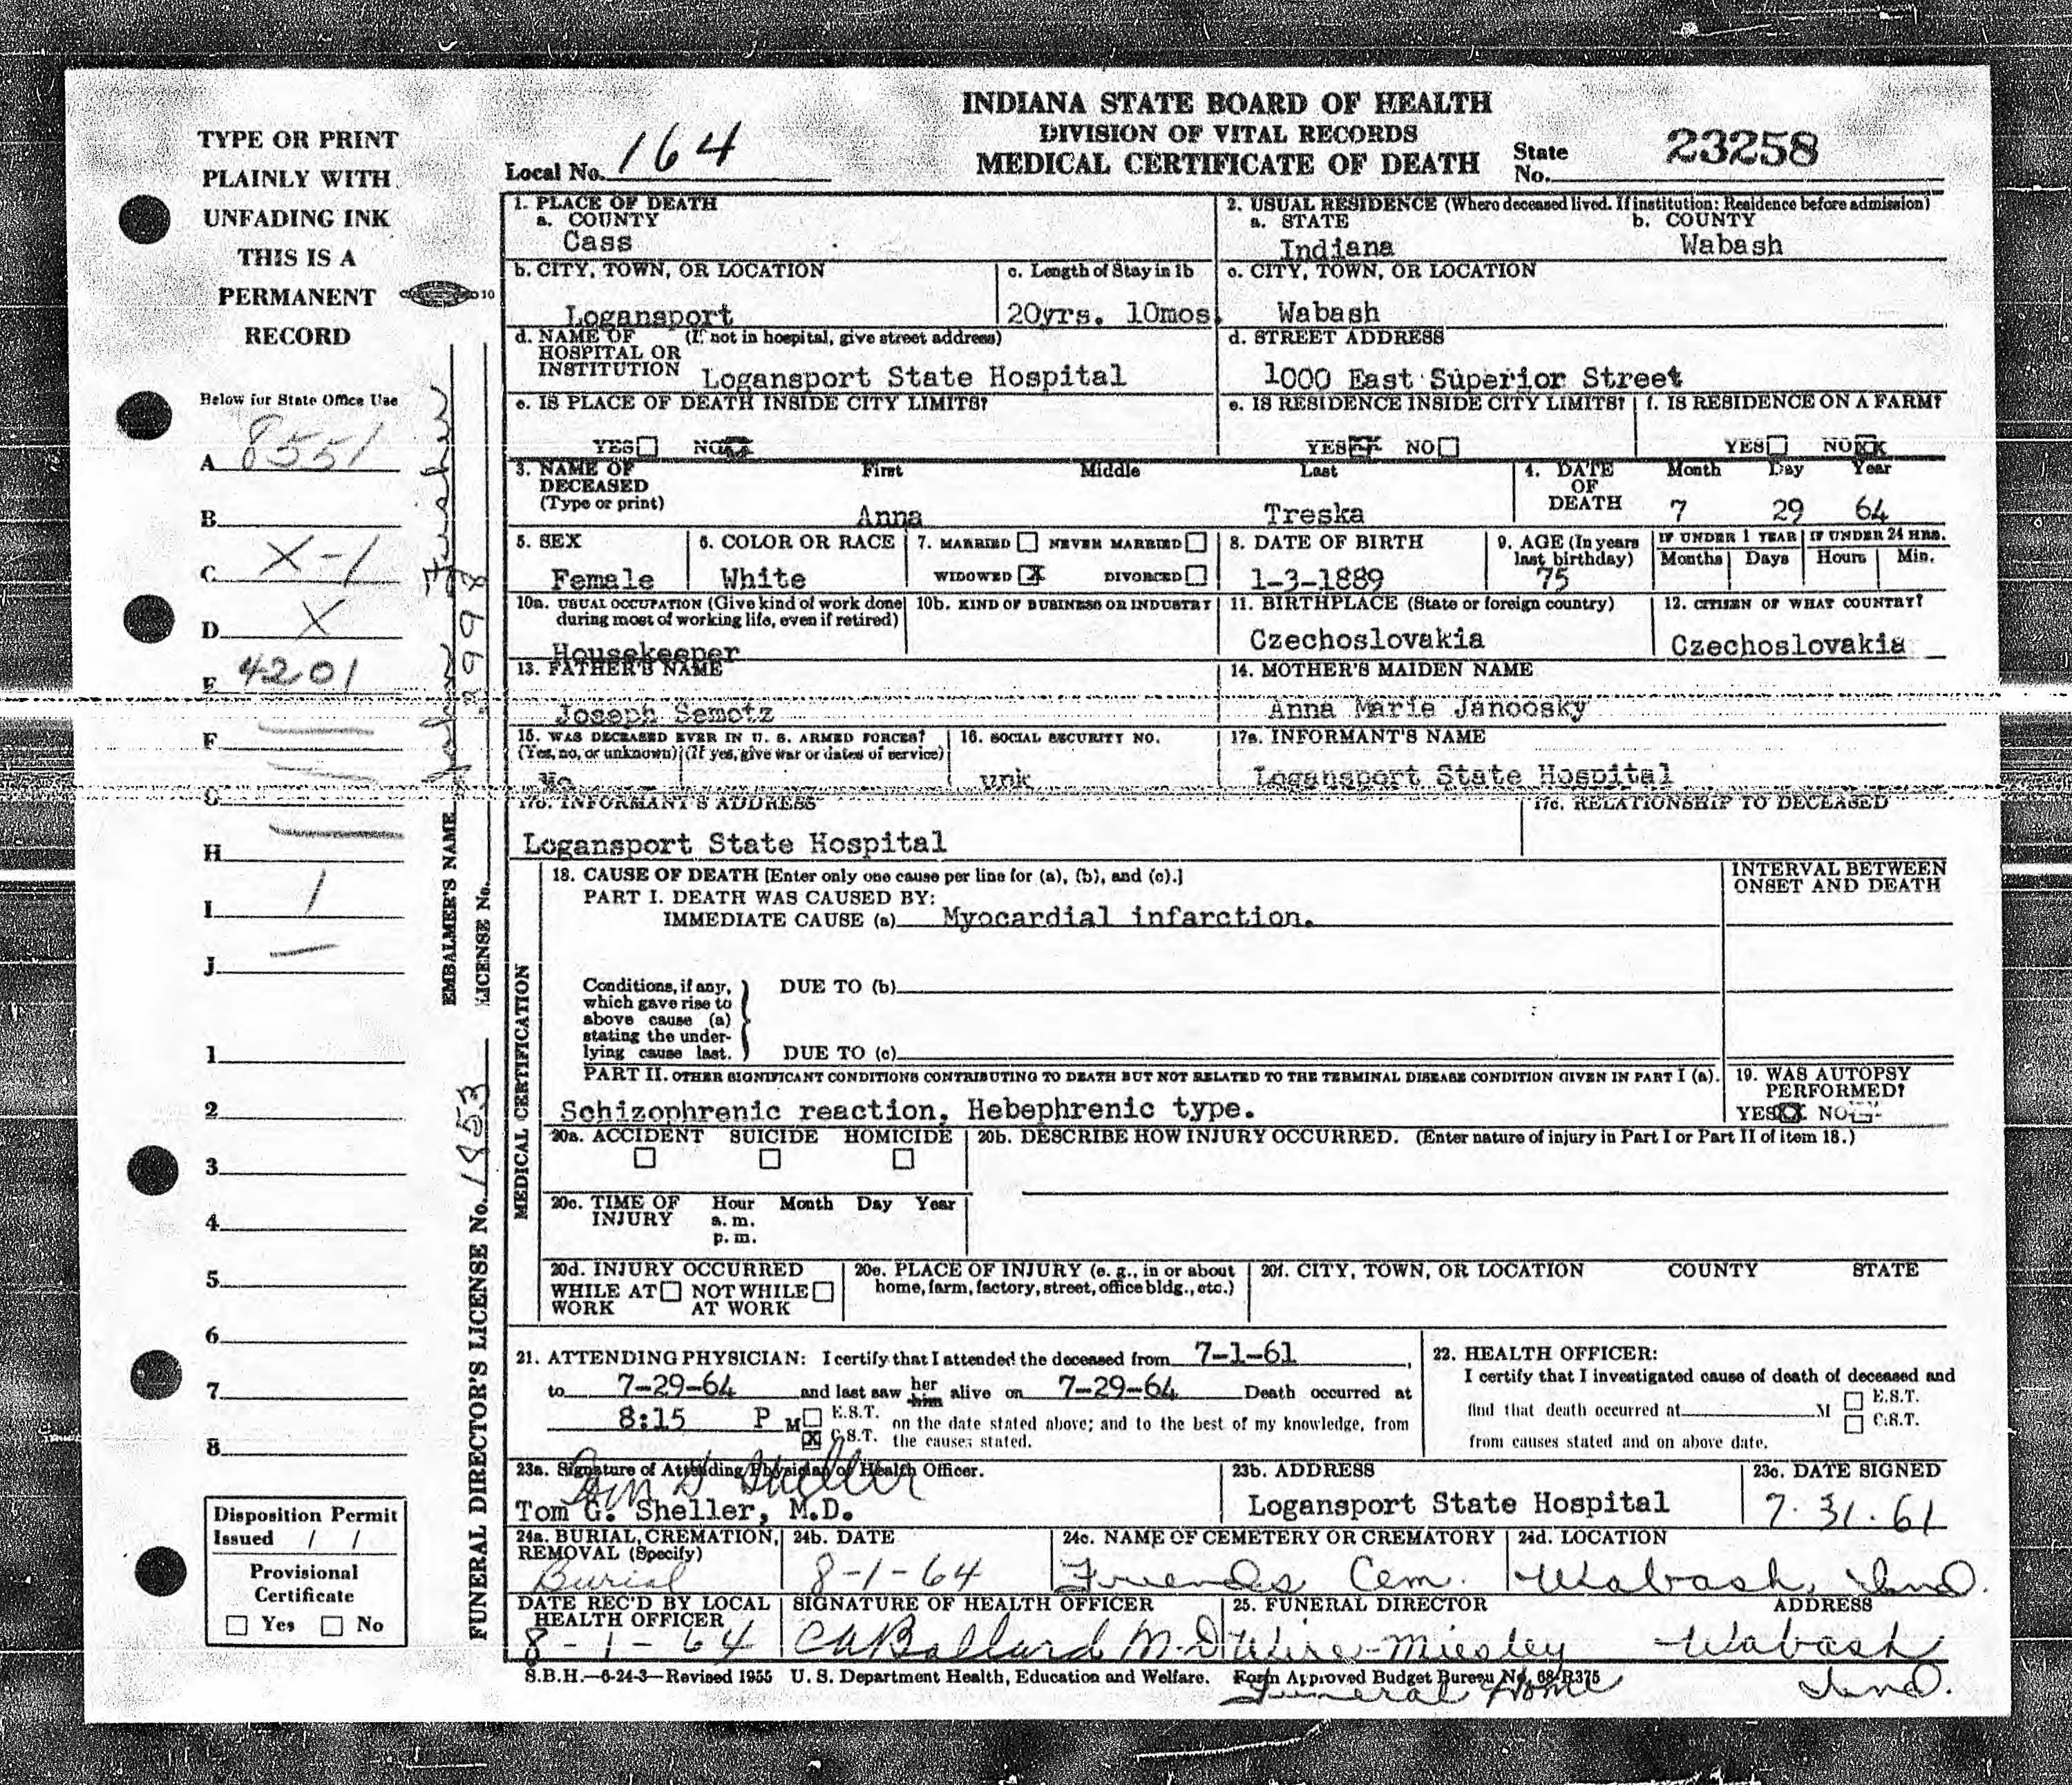 Anna maria simota treska 1889 1964 find a grave memorial indiana death certificate name anna treska anna semotz gender female race white age 75 birth date 3 jan 1889 birth place czechoslovakia death date aiddatafo Gallery